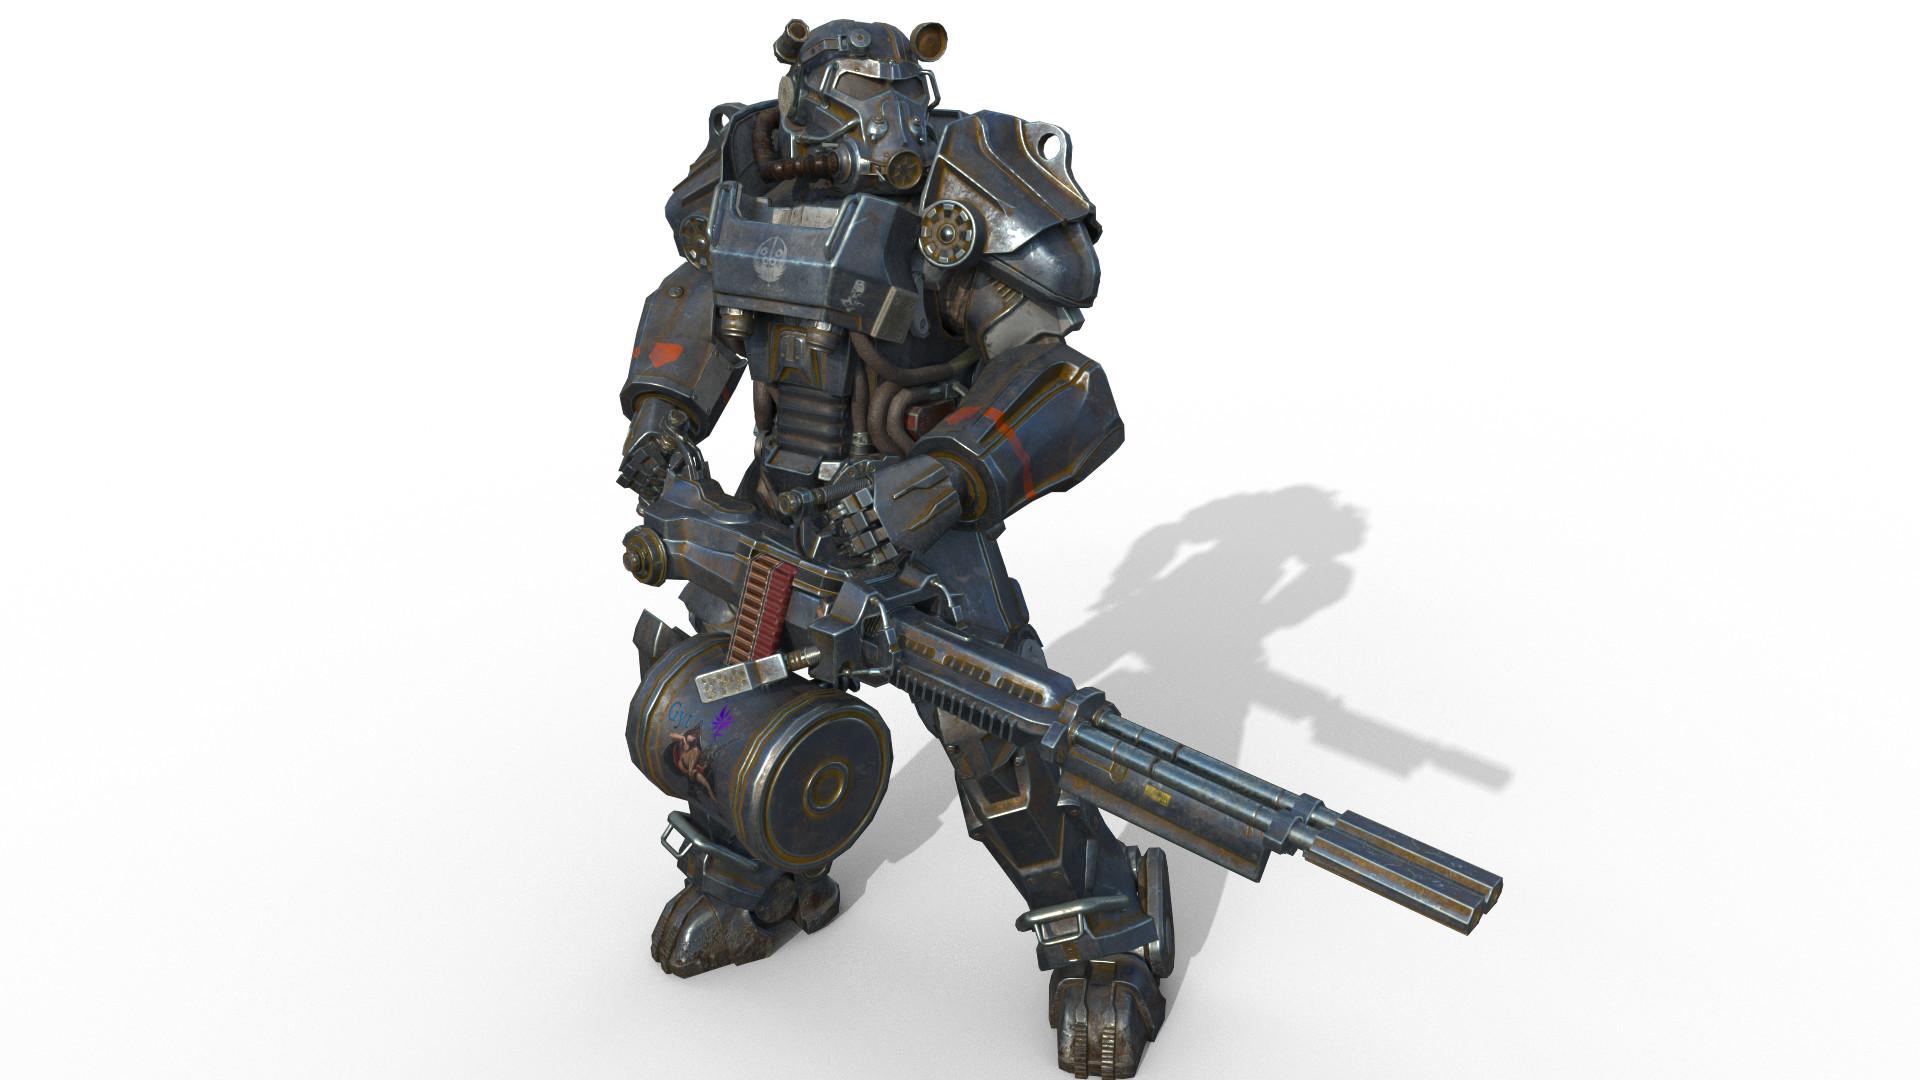 ArtStation - fallout4 t60 power armor, Yuntian Gao